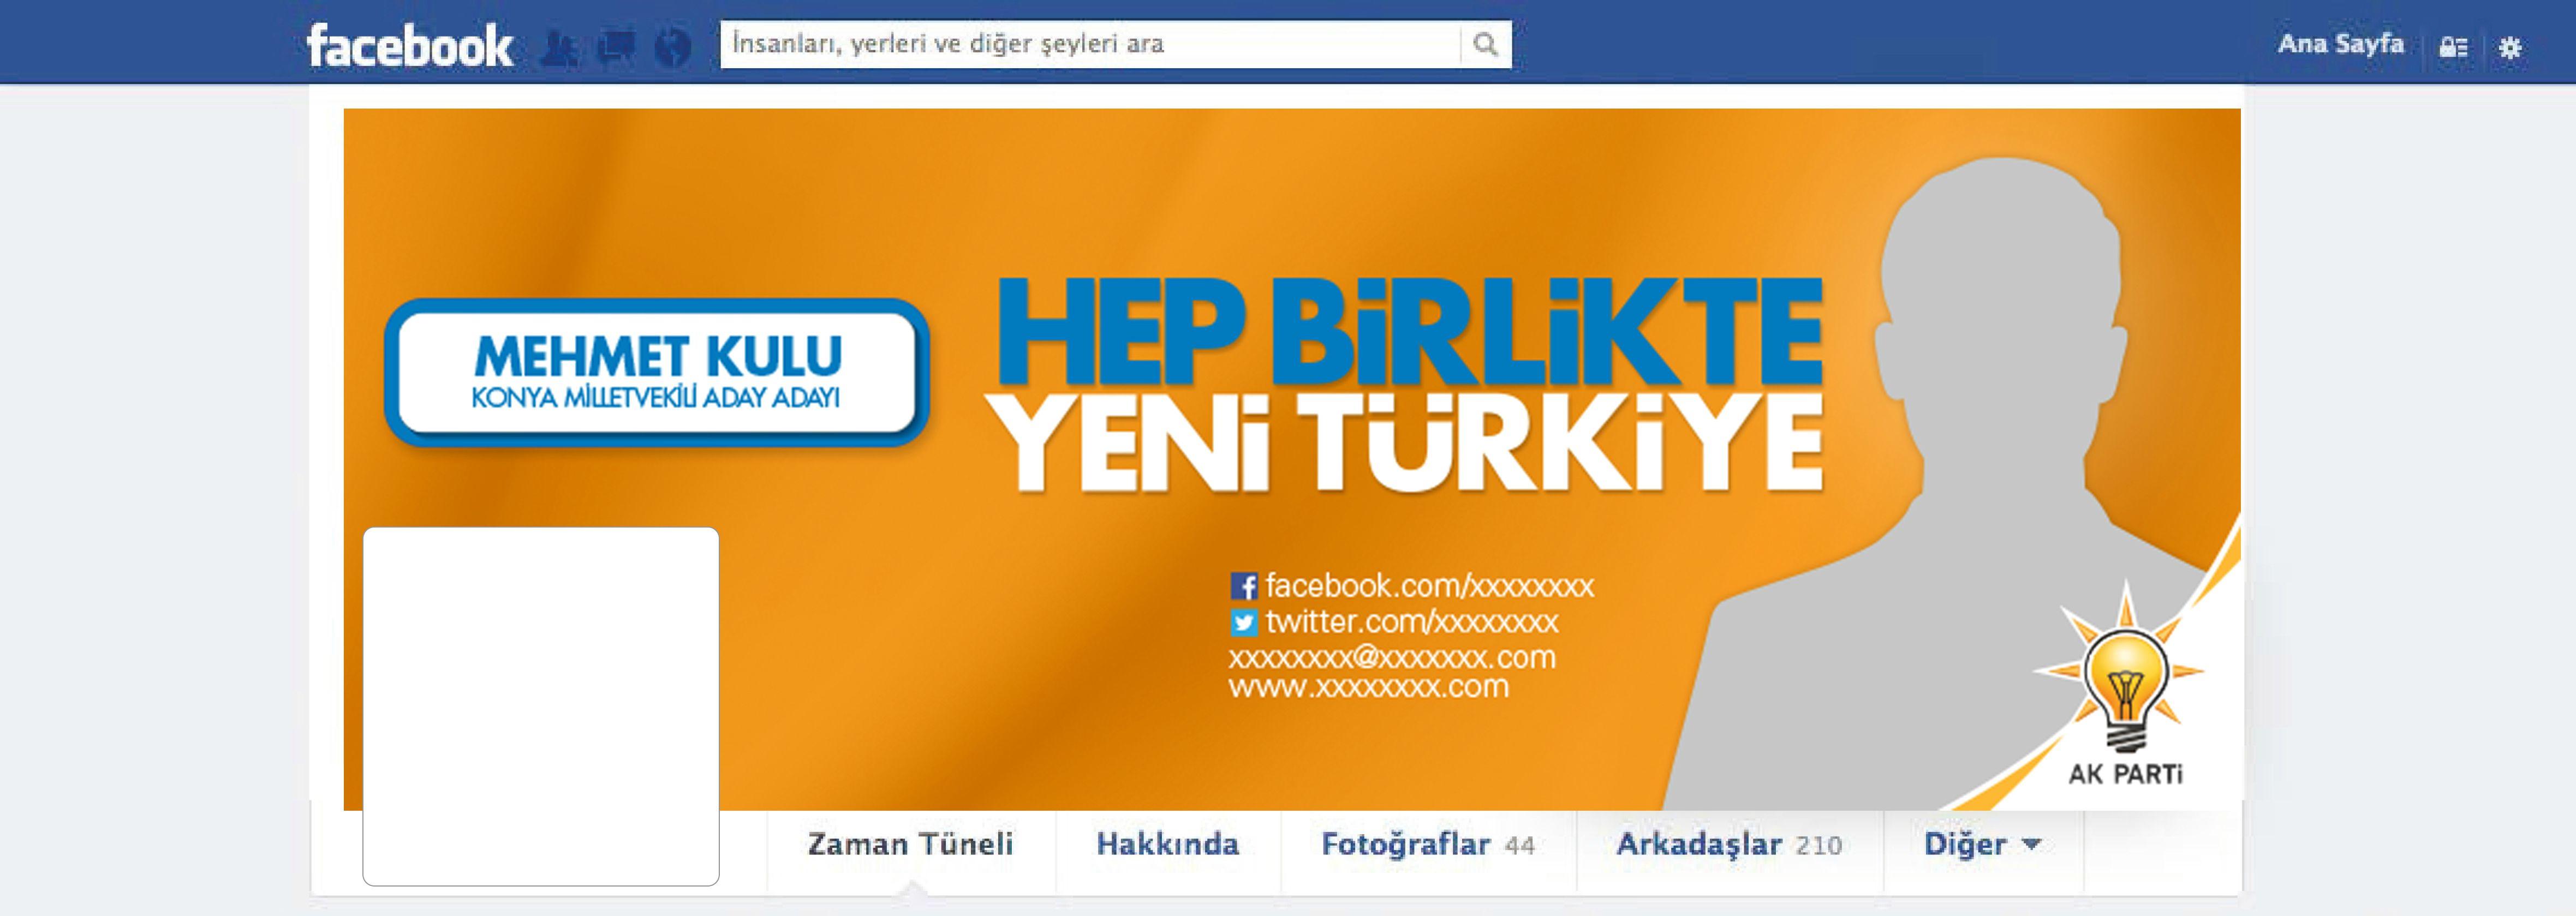 akparti-facebook.jpg